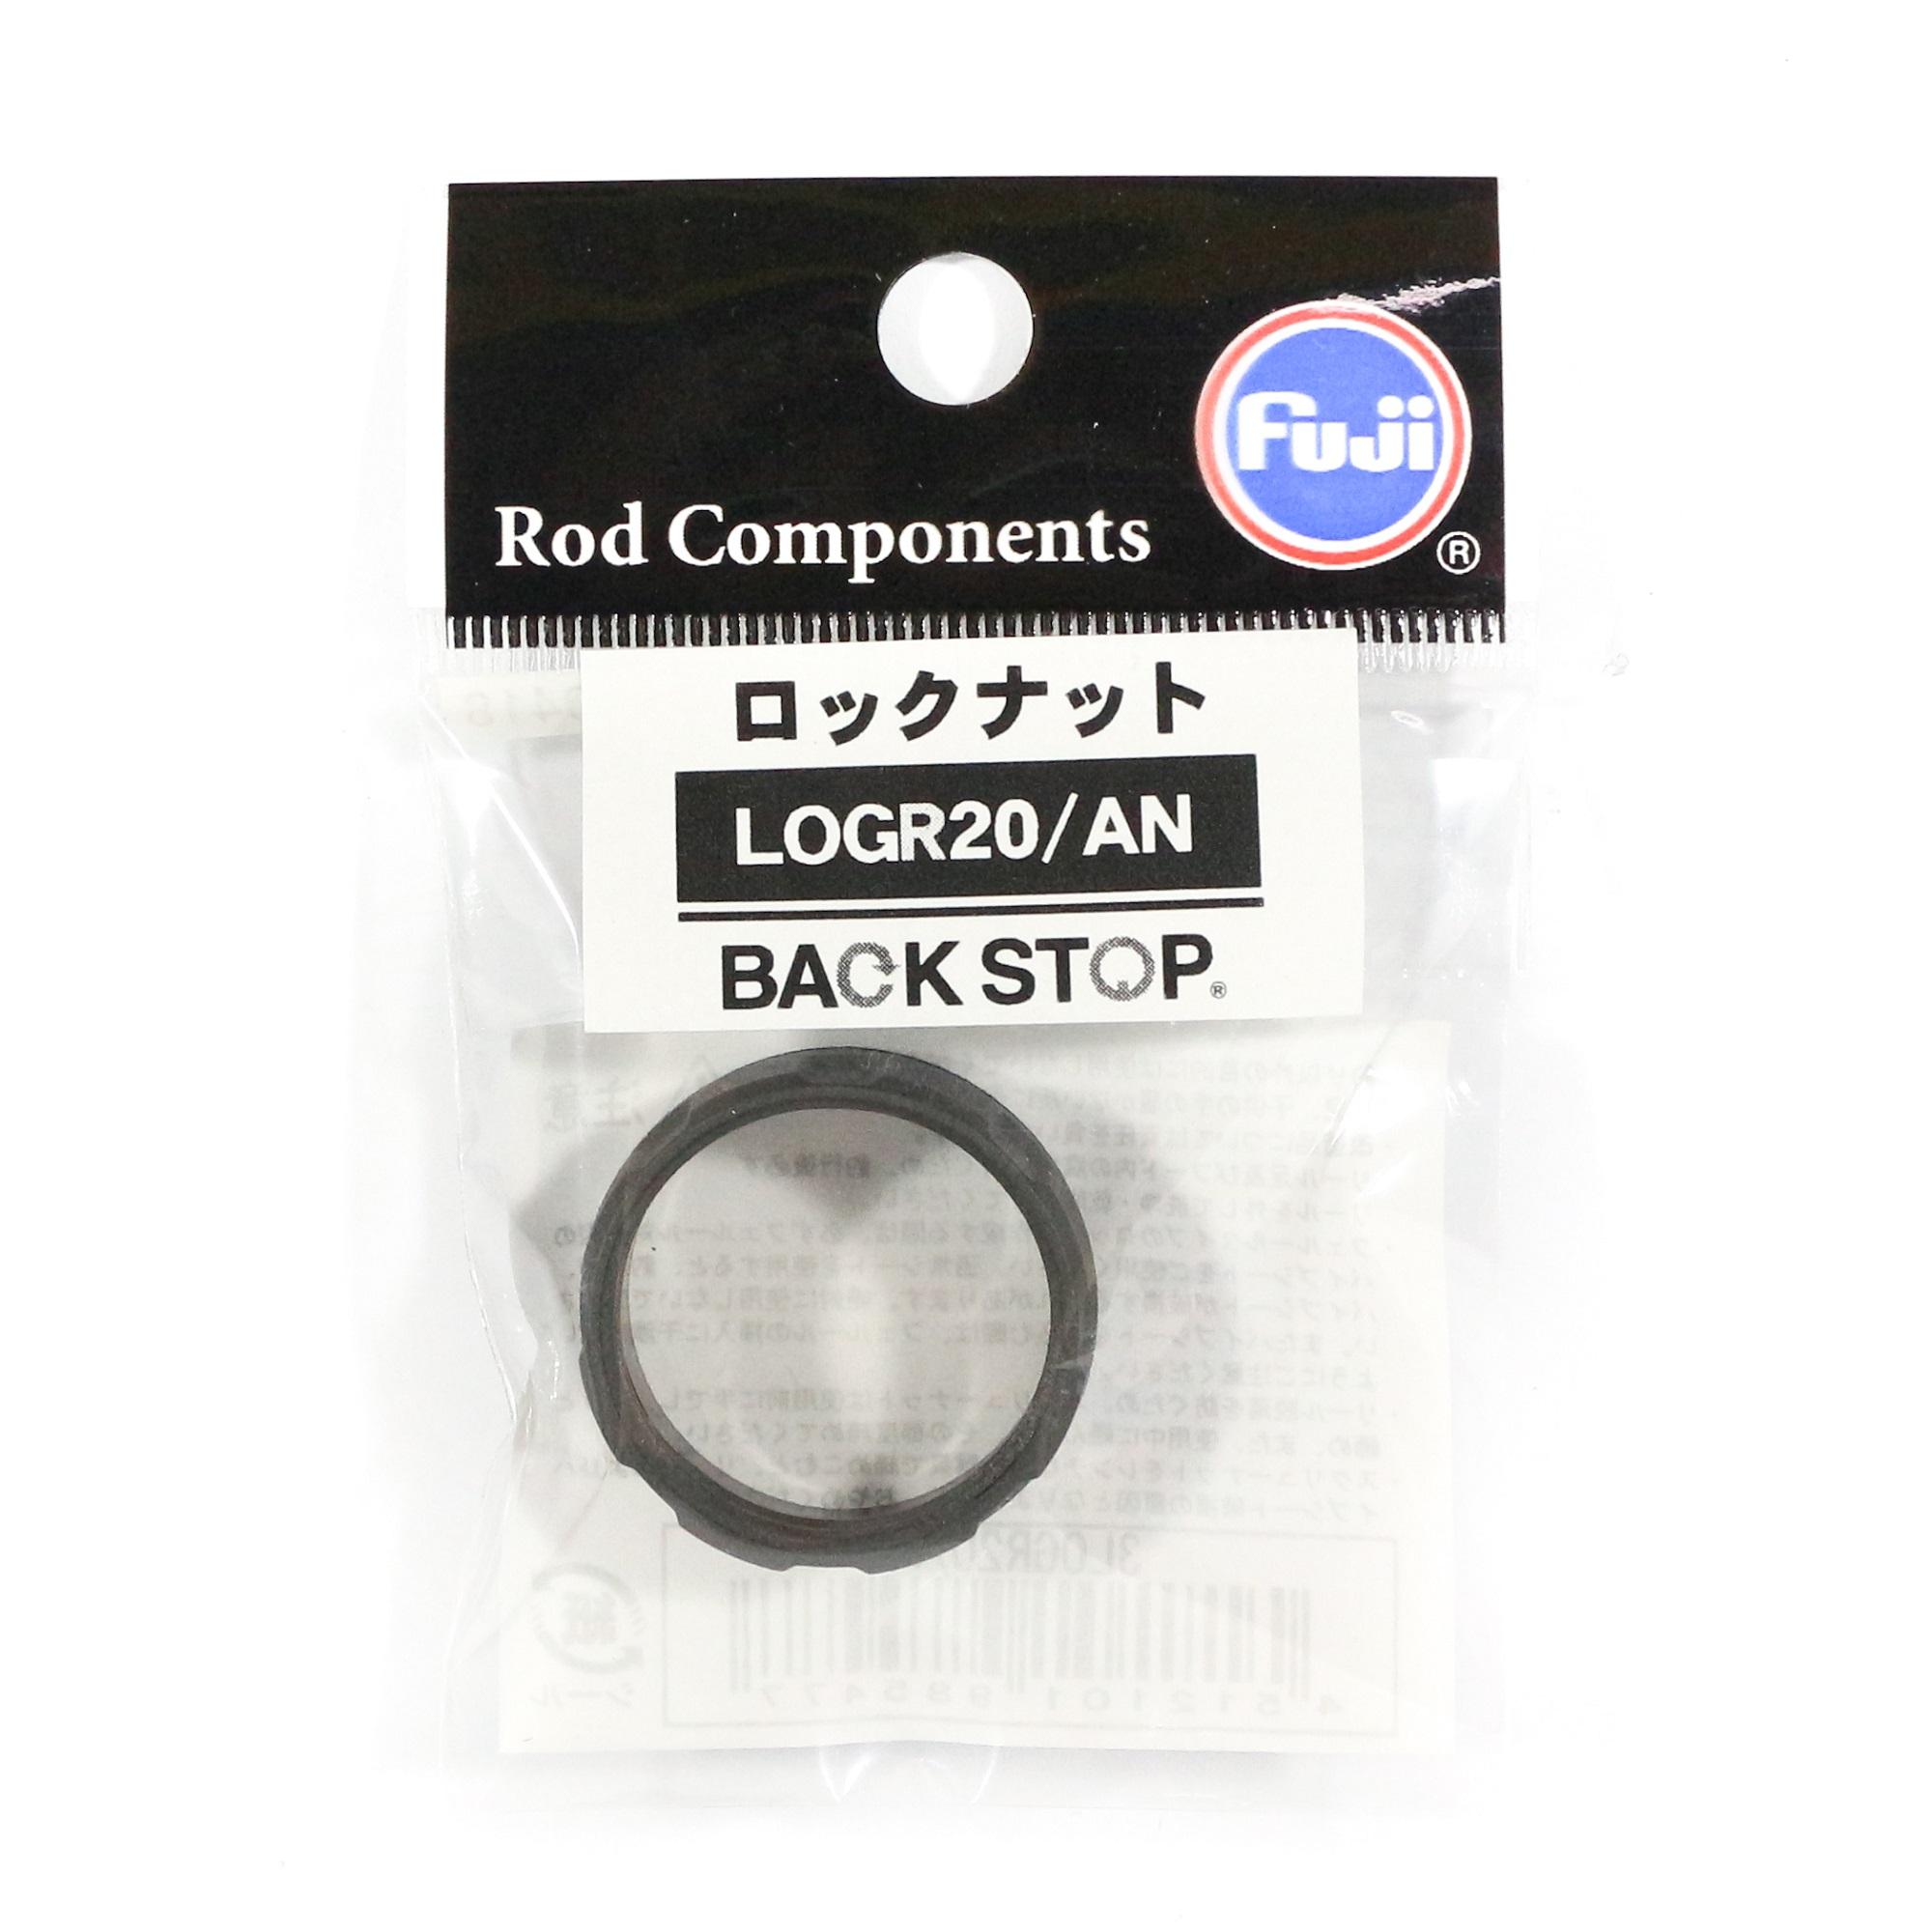 Fuji LOGR/AN Size 20/AN Reel Seat Back Stop Lock Nut x 1 piece (5477)